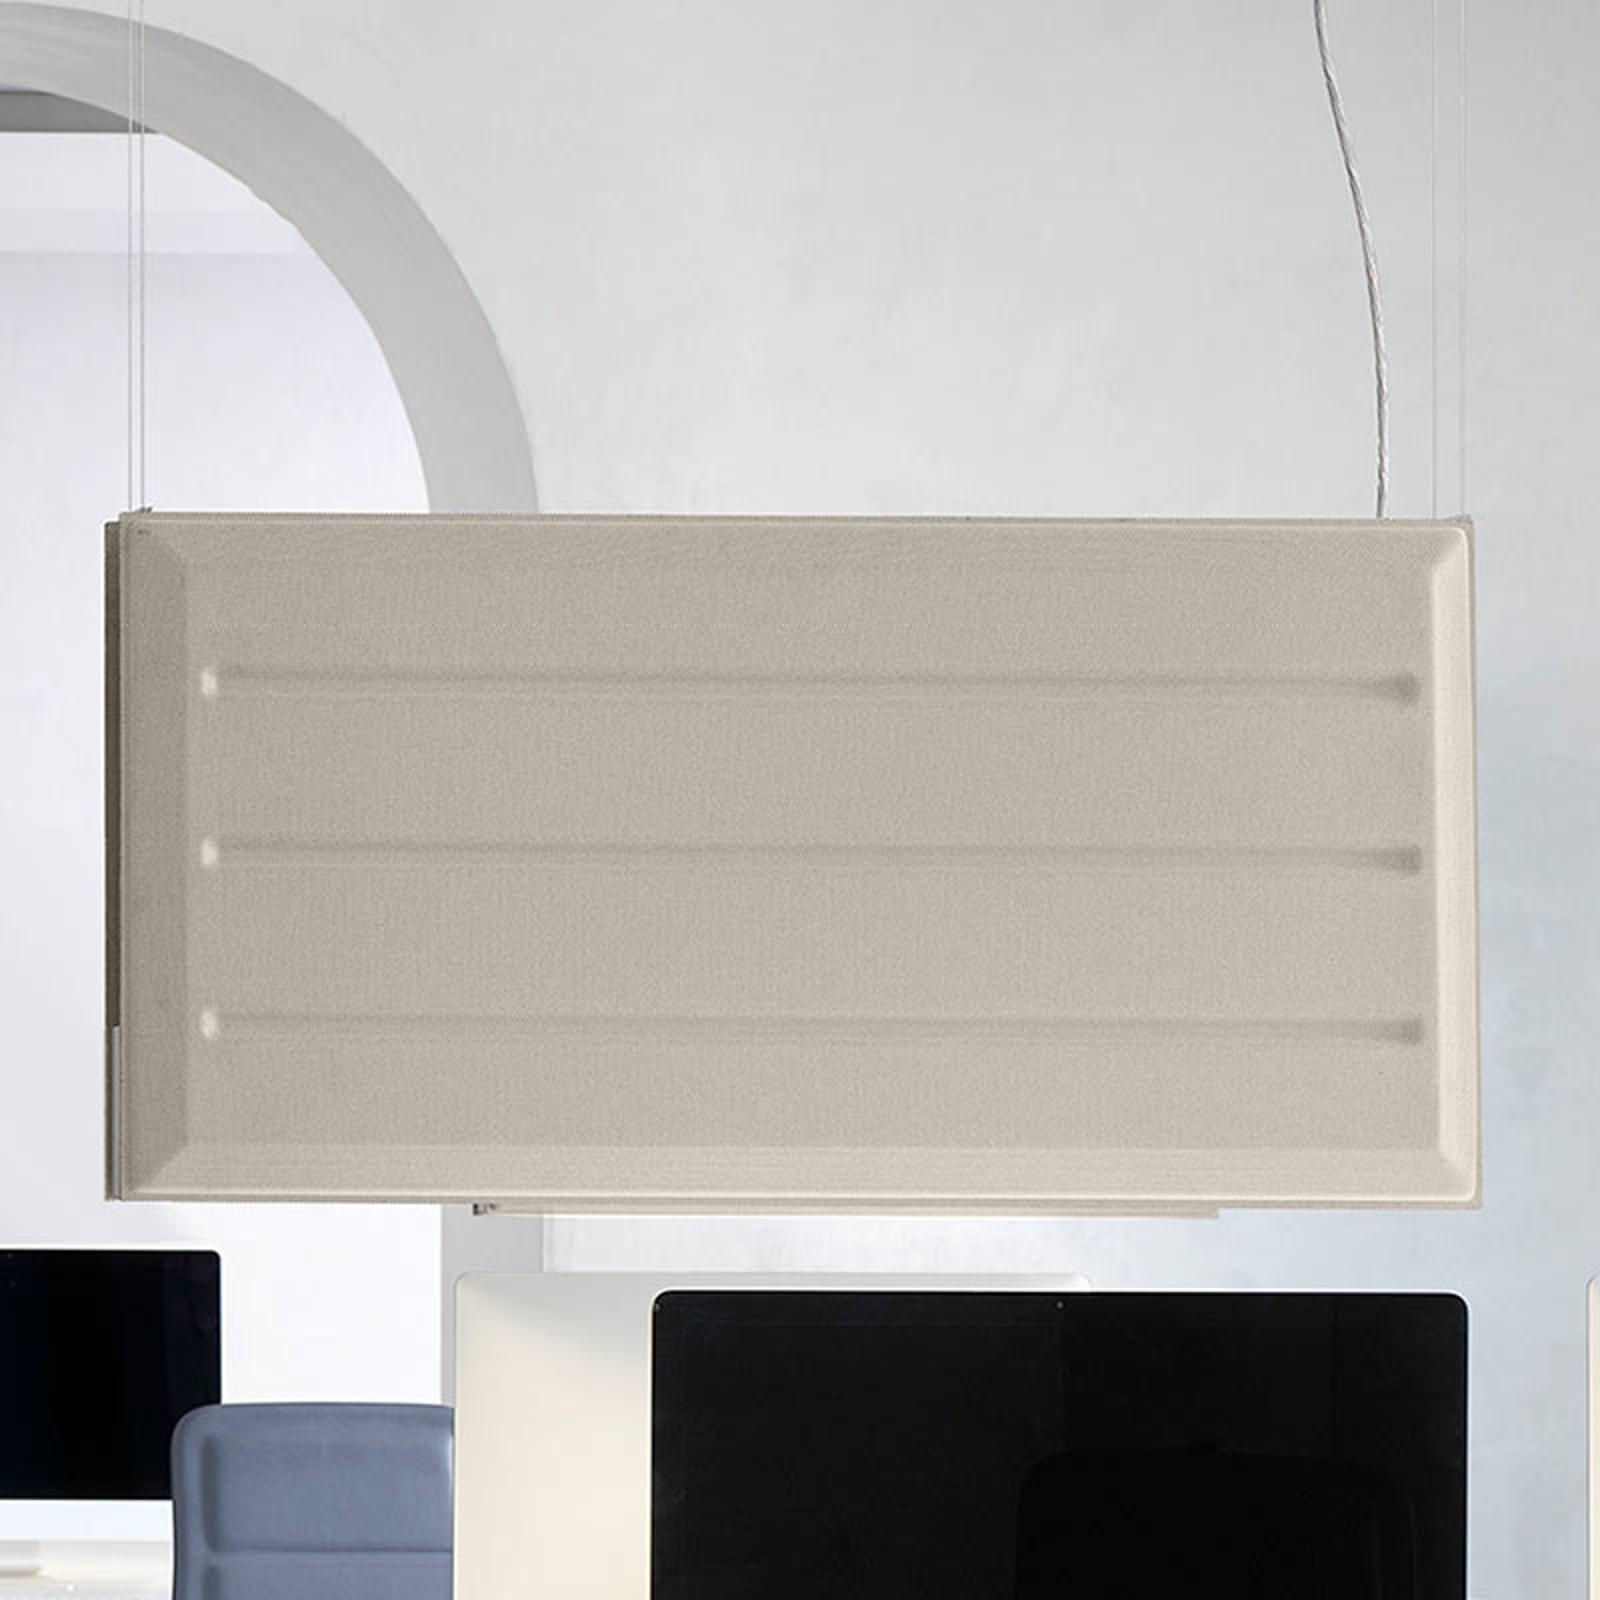 Luceplan Diade LED-Hängelampe vertikal beige